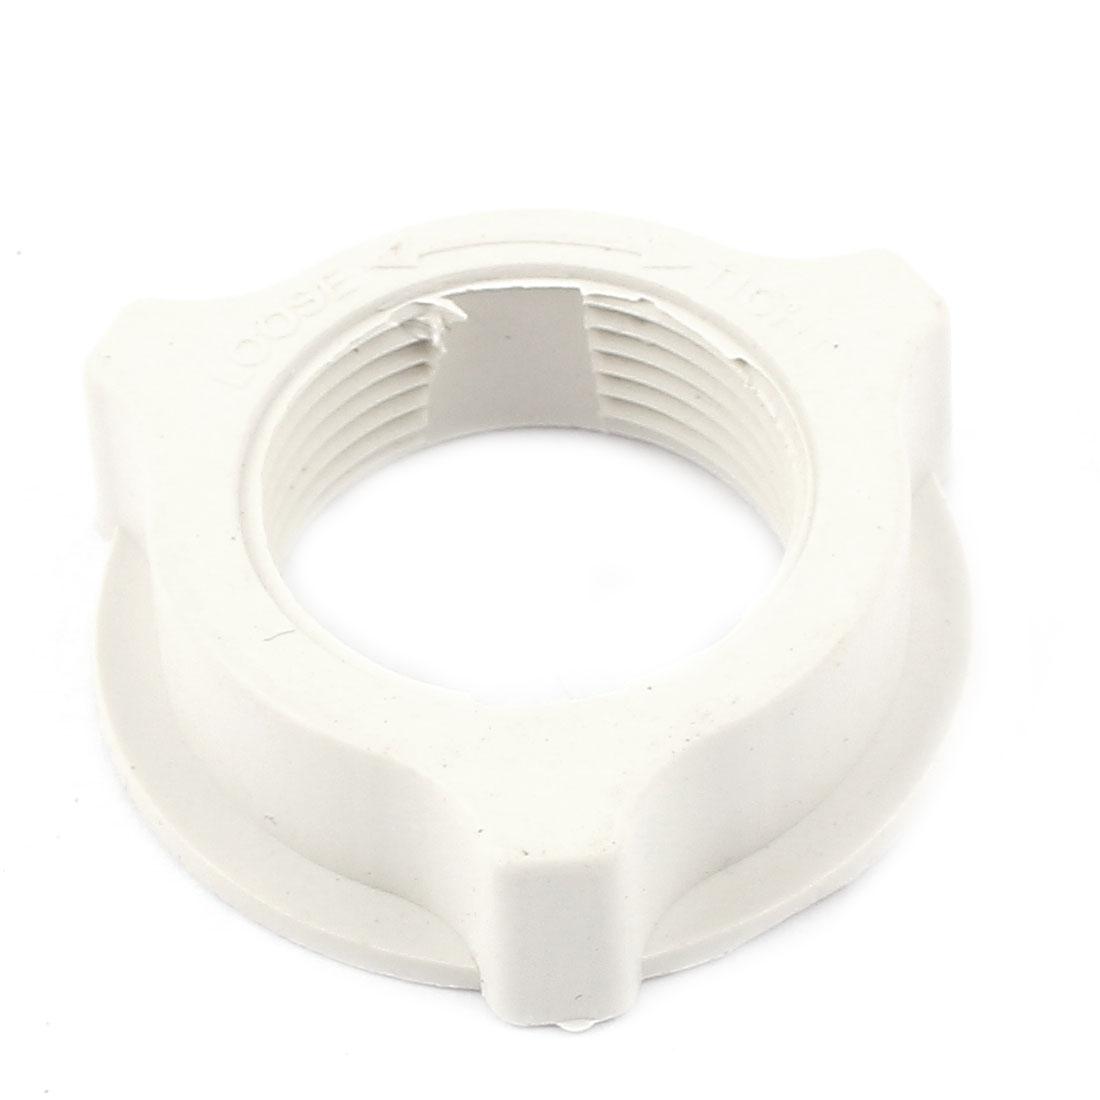 White Plastic 31mm Thread Dia Fastening Screw Nut Fan Guard Fastener